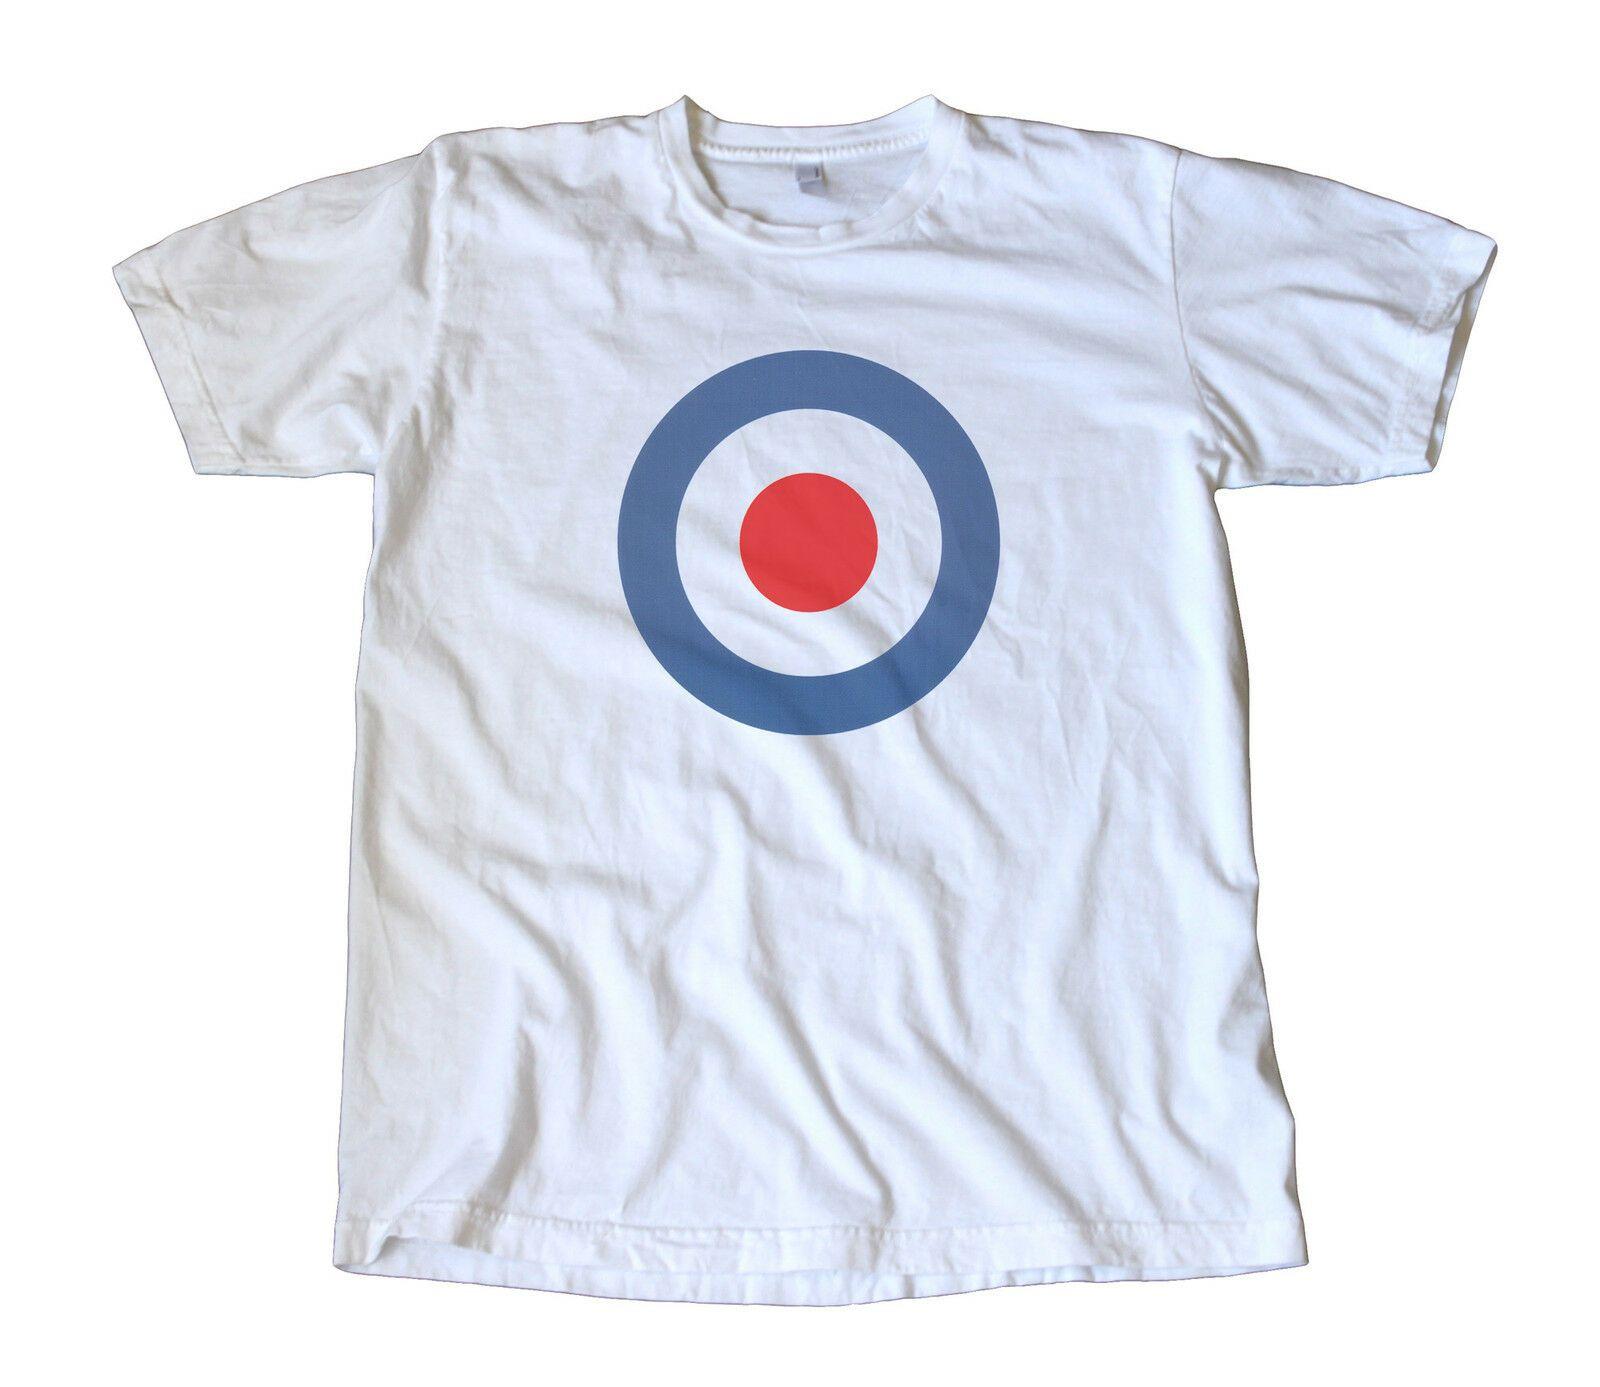 08d71b5567de51 Großhandel Vintage Classic RAF Aufkleber T Shirt The Who, Mod, Vespa,  Lambretta, ScooterFunny Kostenloser Versand Unisex Casual Tshirt Top Von  Pepitaprint, ...